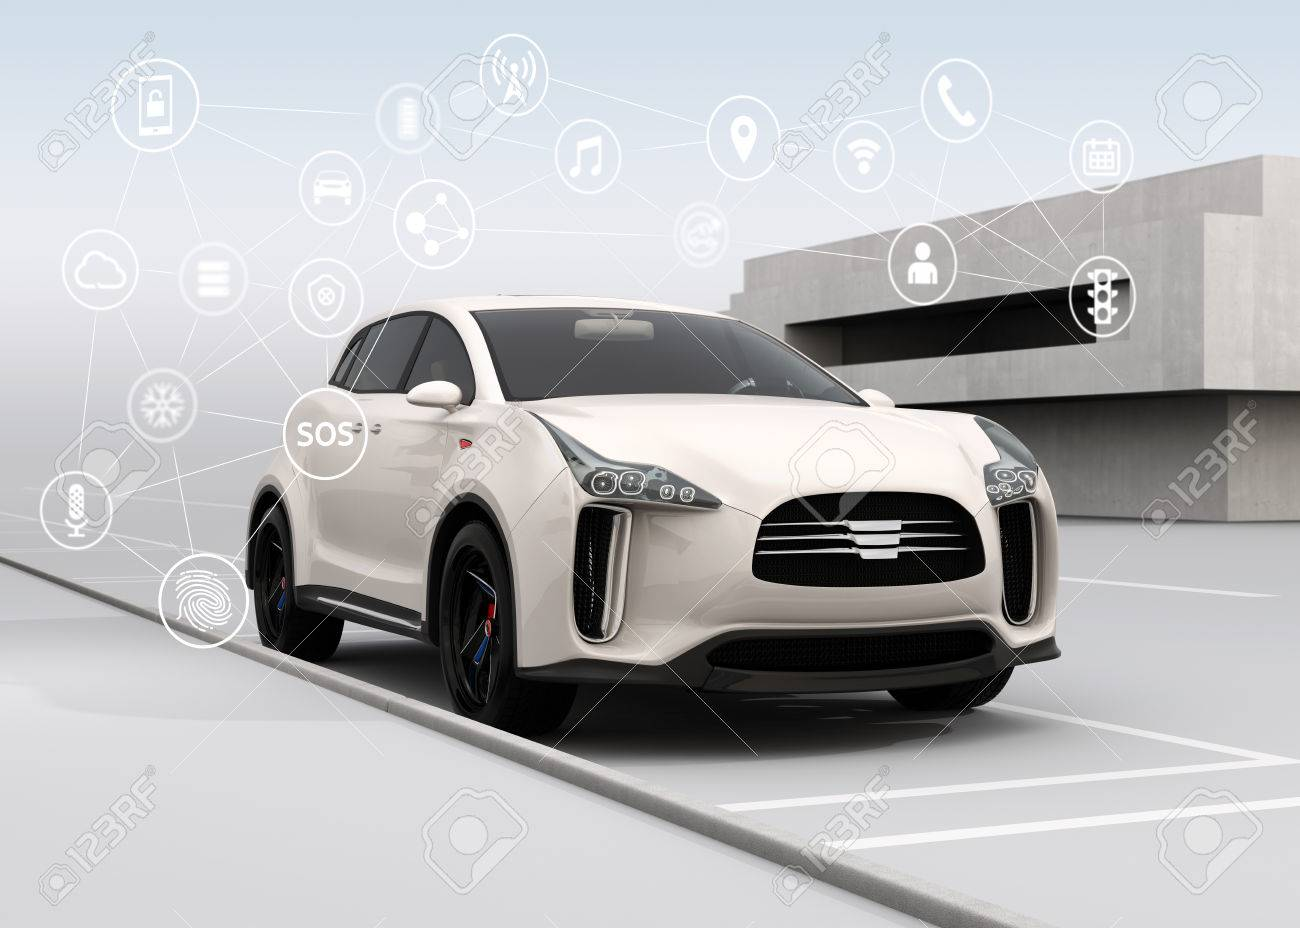 Connected cars and autonomous cars concept. 3D rendering image. - 66082928